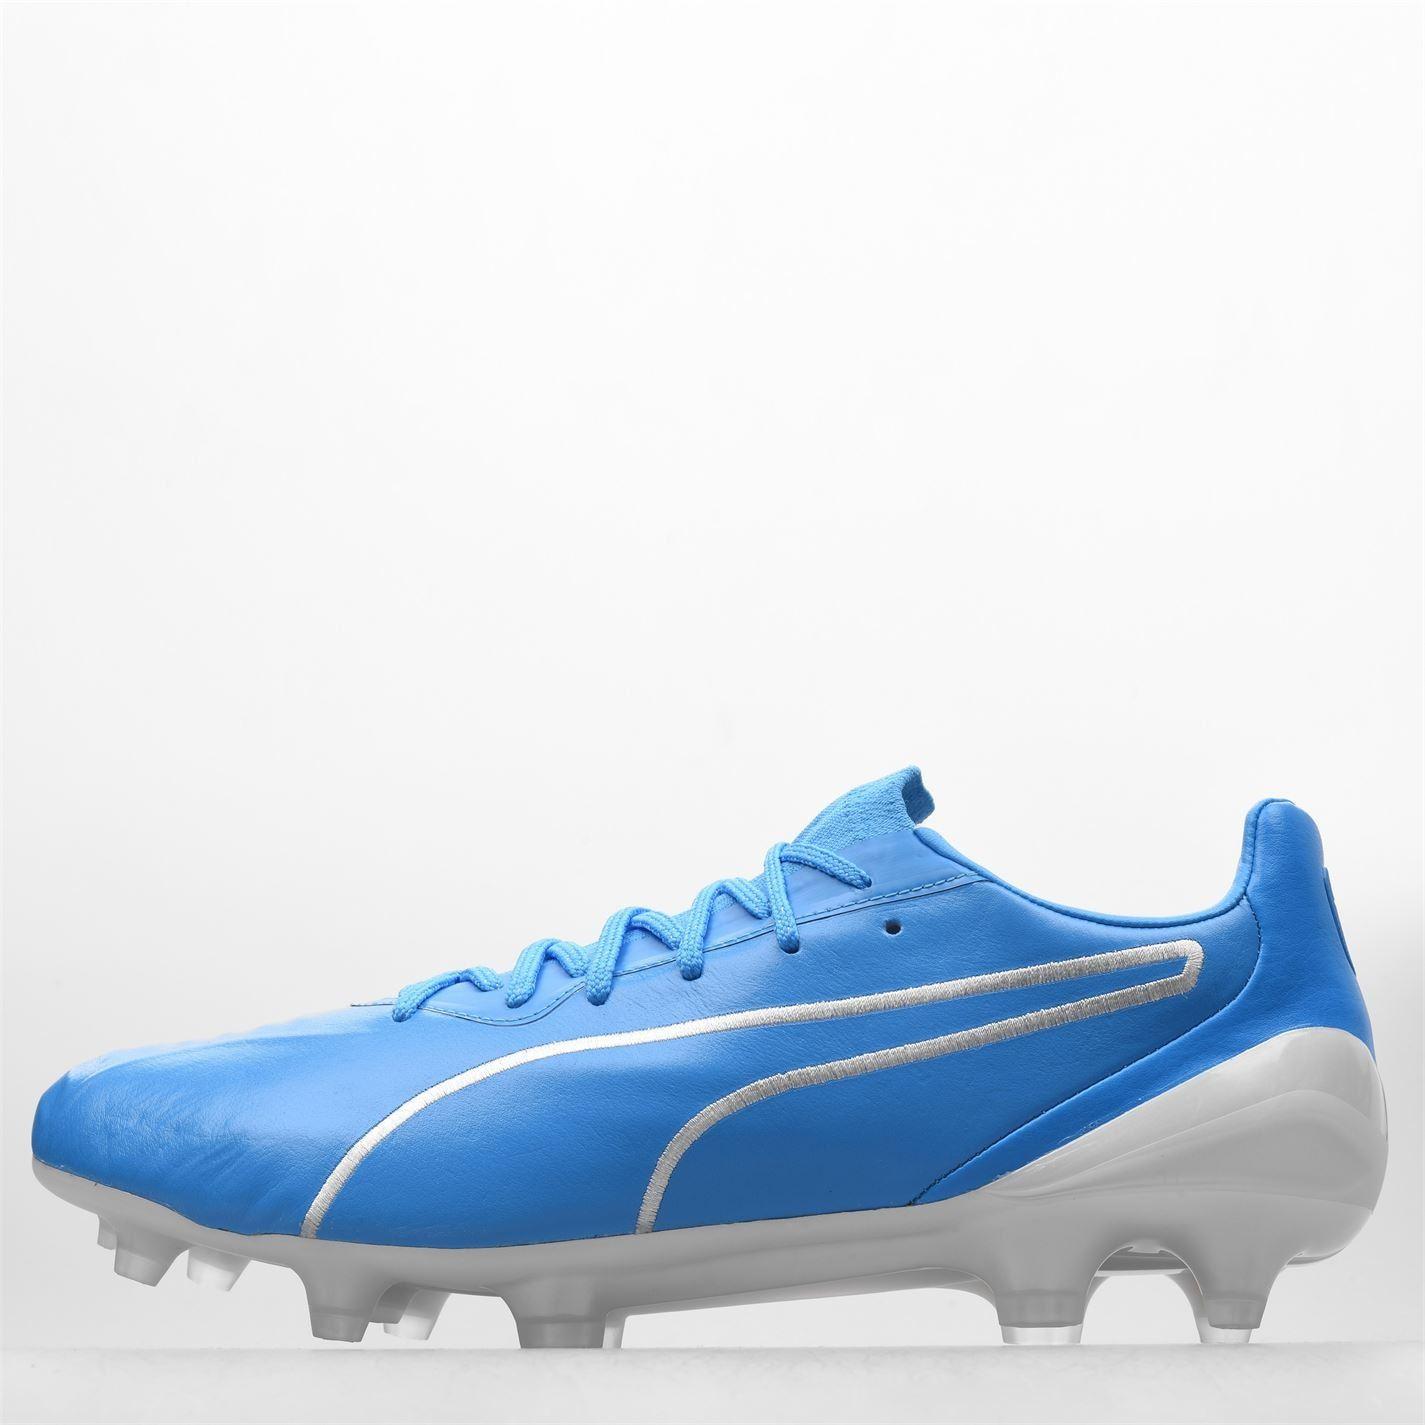 miniature 7 - Puma-King-FG-Firm-Ground-Football-Bottes-Homme-Chaussures-De-Foot-Crampons-Baskets